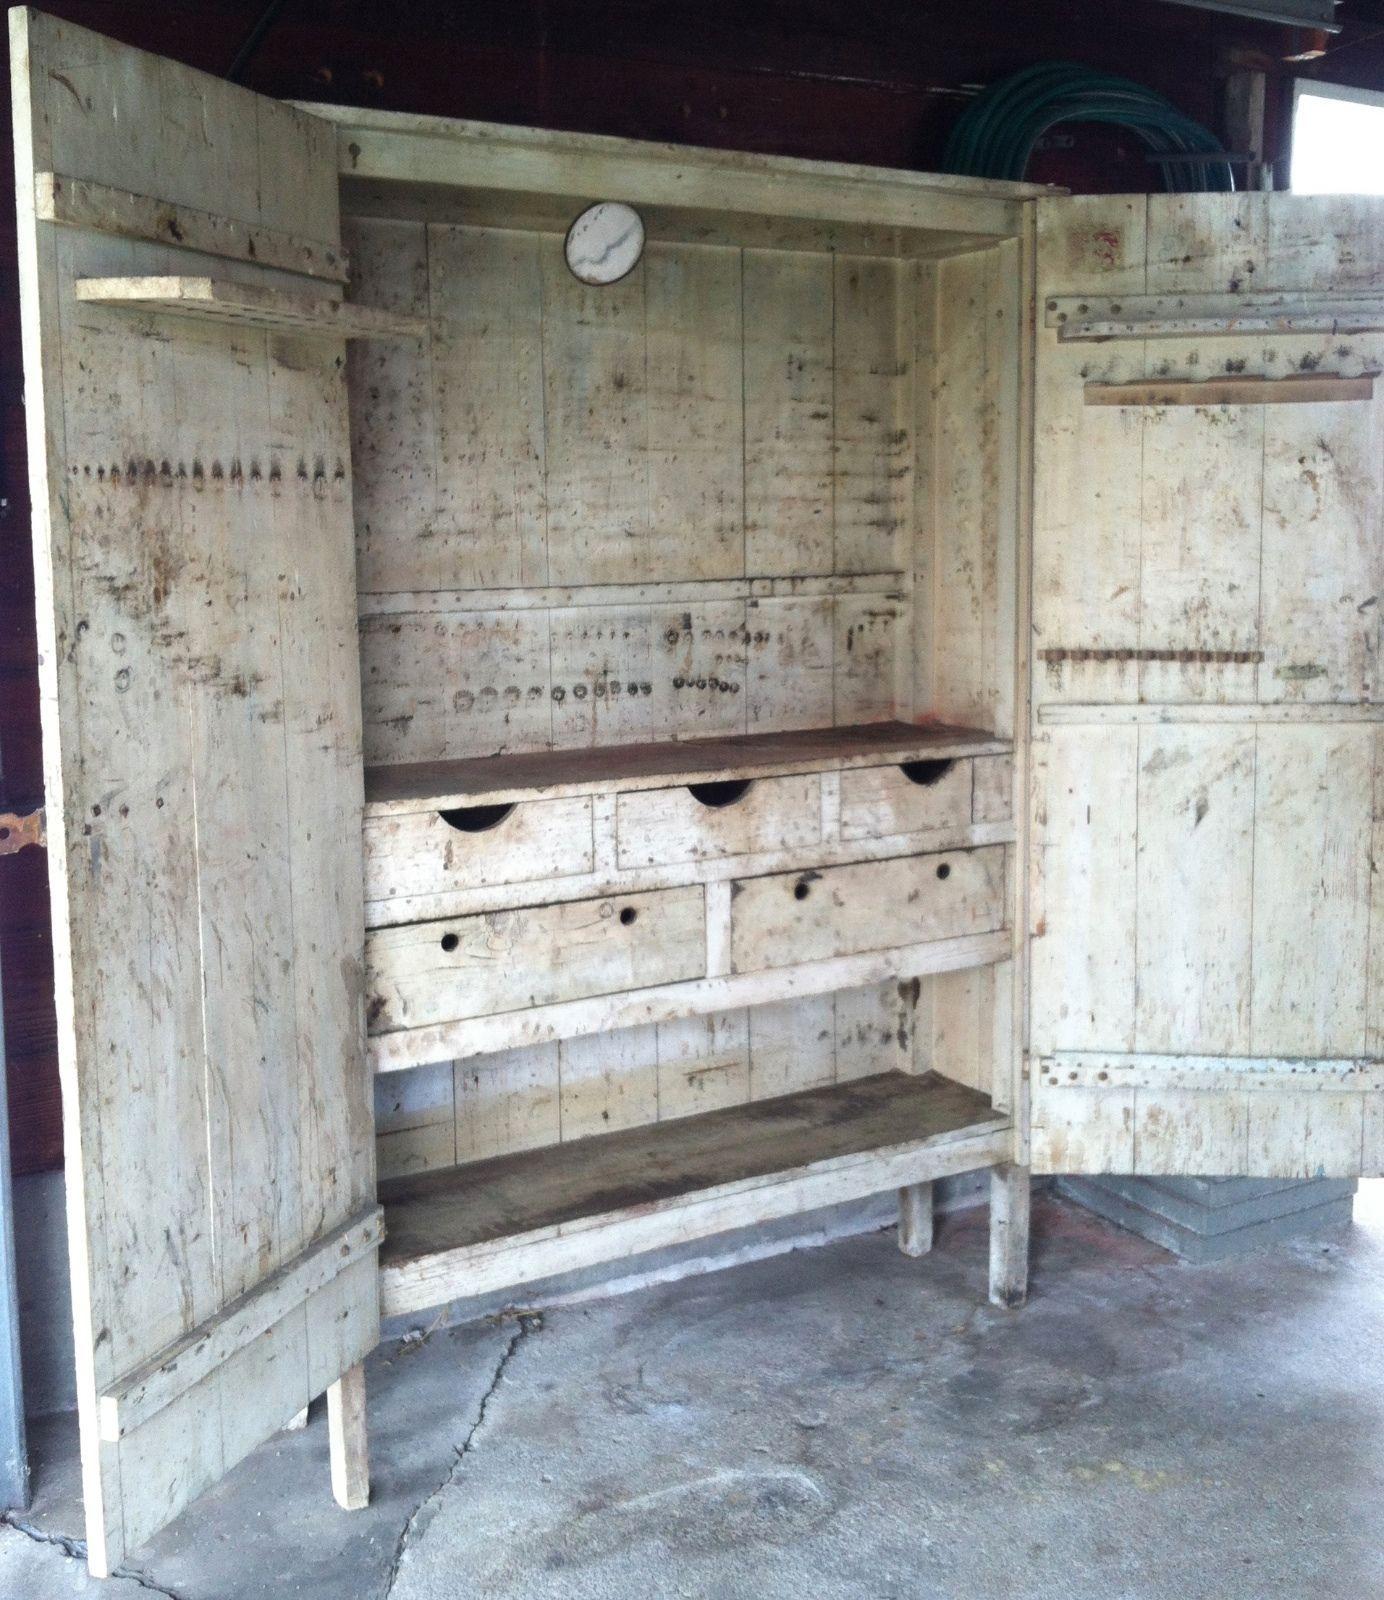 Large Vintage Antique Primitive Cupboard Cabinet Chippy Paint Shabby | eBay - Large Vintage Antique Primitive Cupboard Cabinet Chippy Paint Shabby